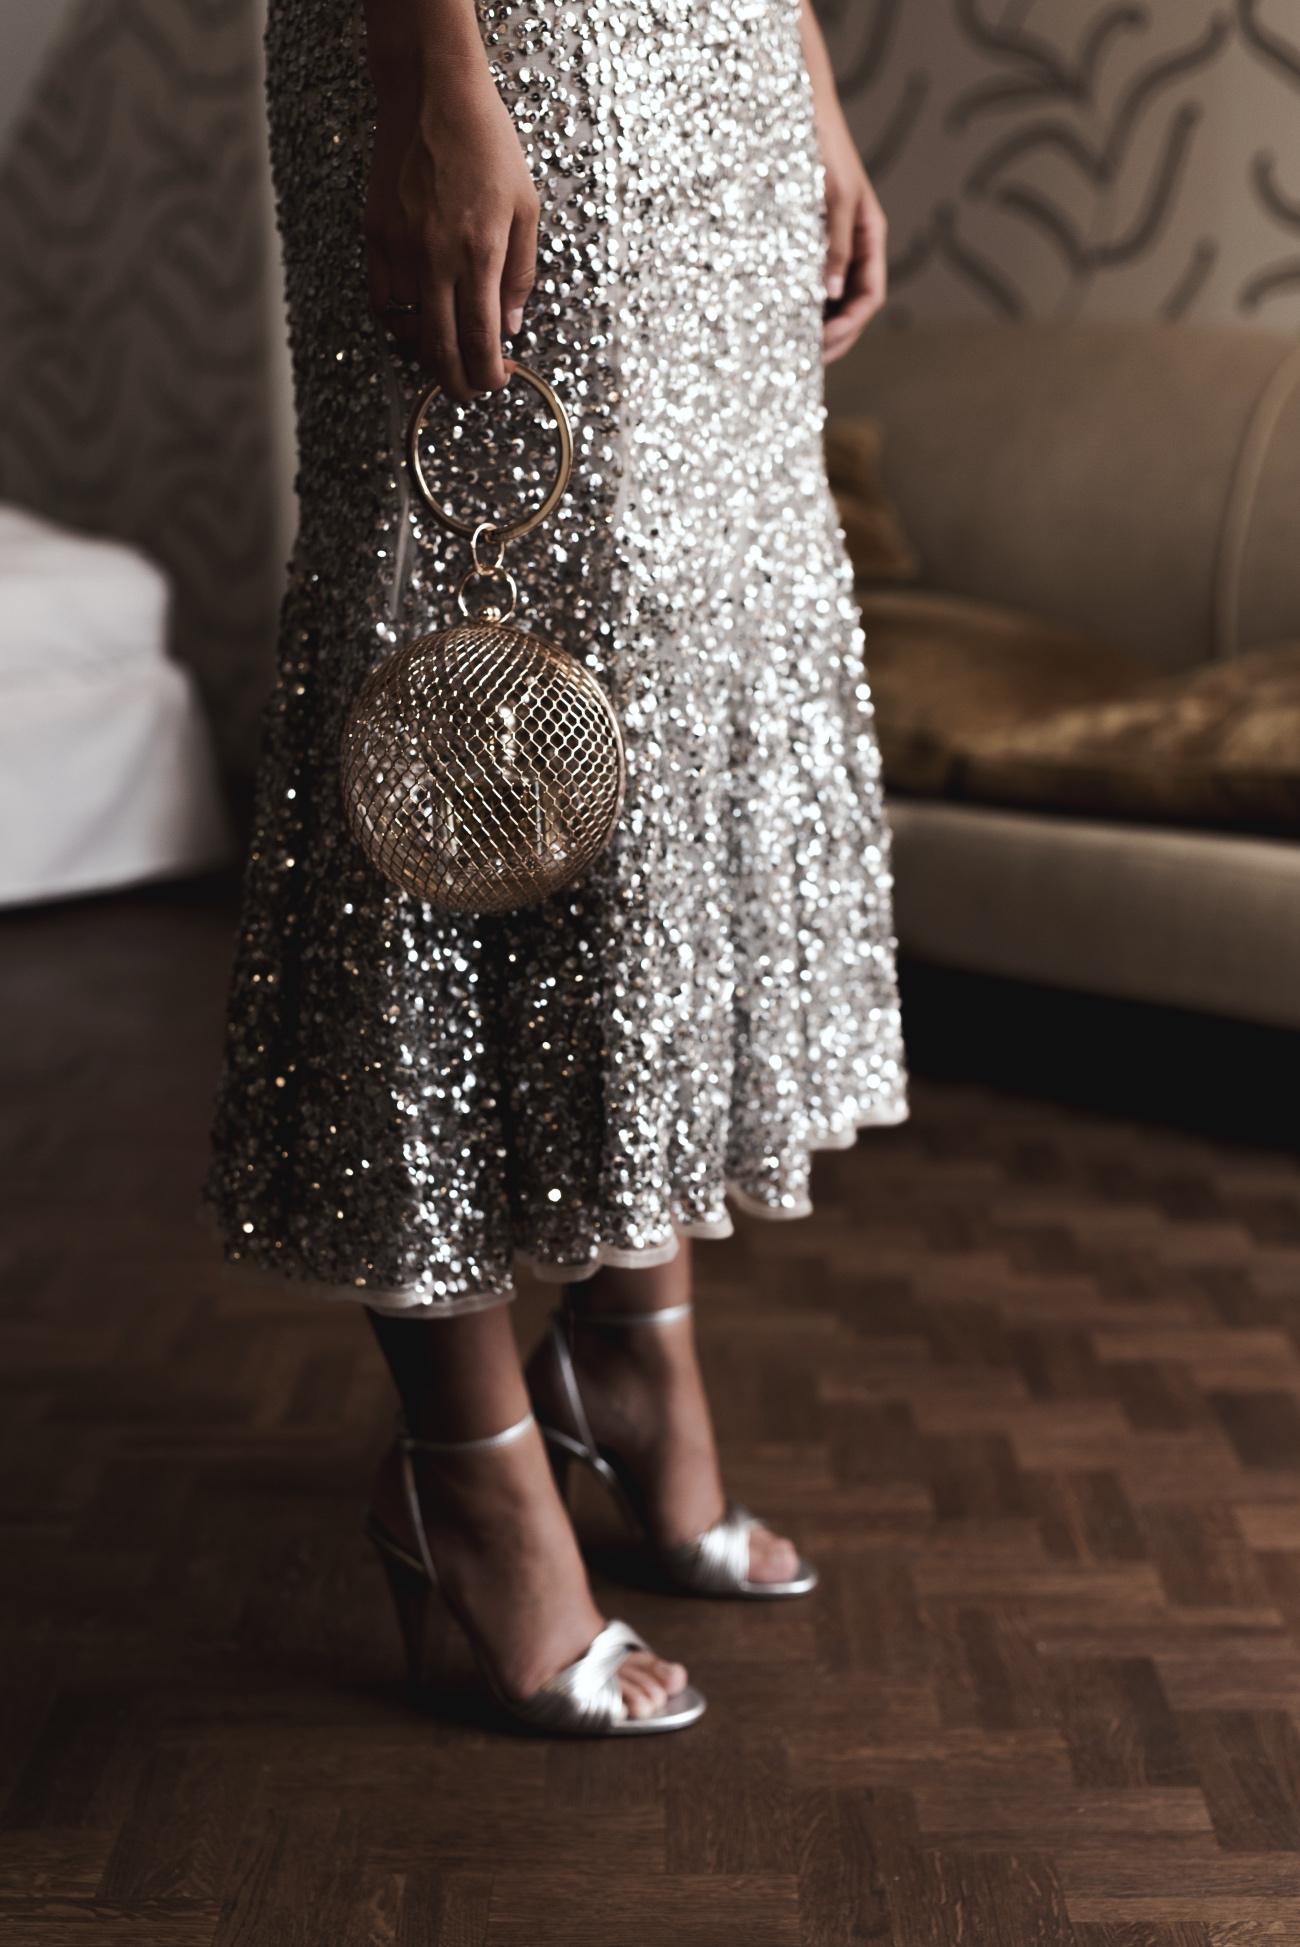 ASOS-Cage-Sphere-Clutch-gold-kugel-tasche-fashiioncarpet